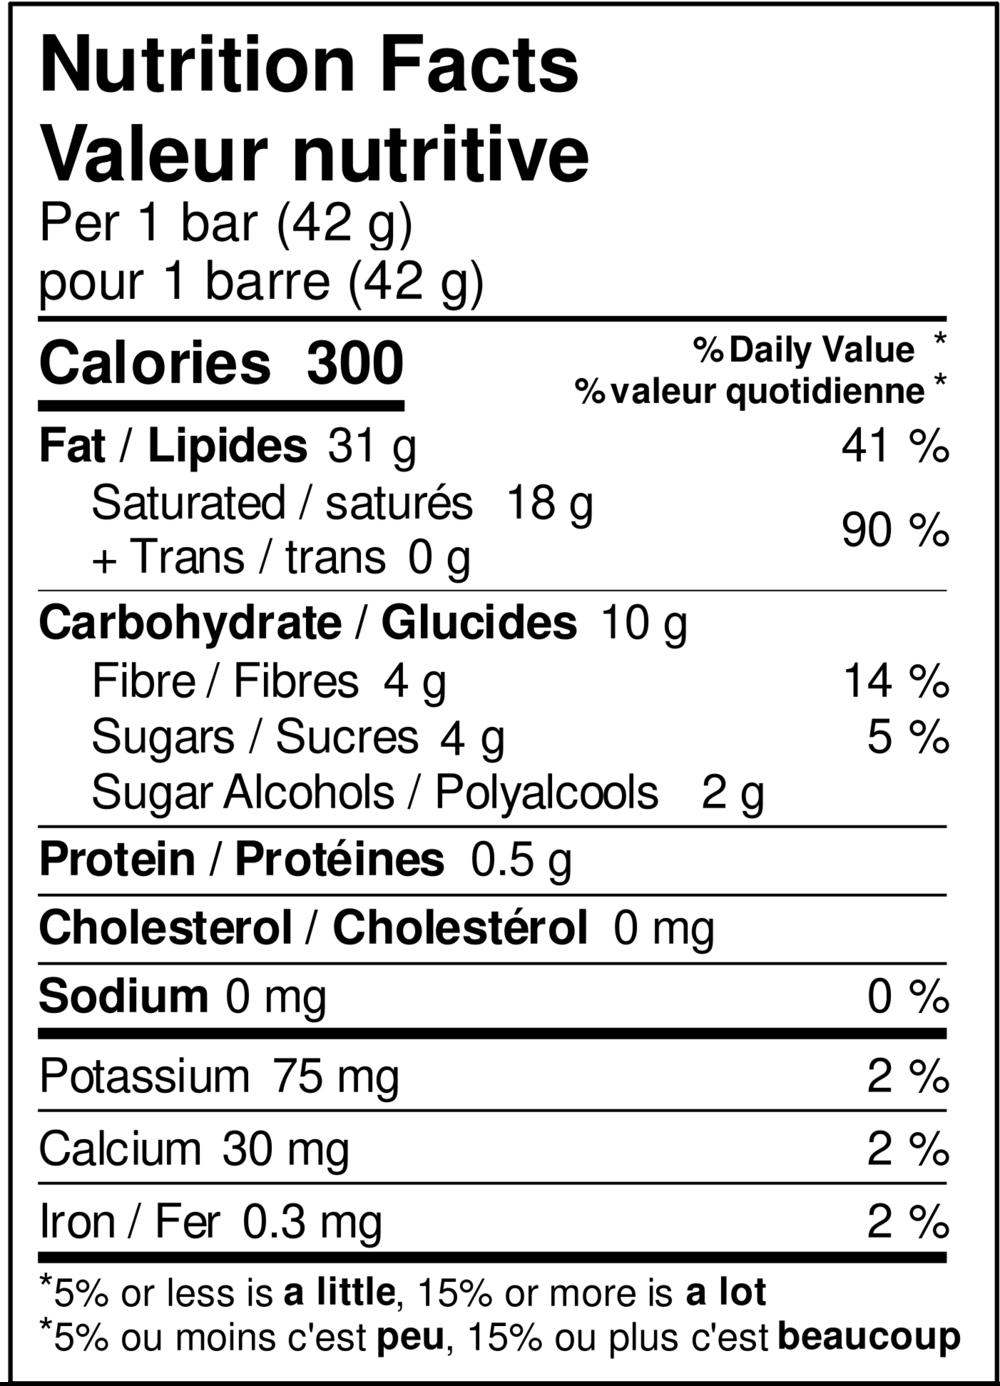 Nutritional Info for Original, Peppermint and Orange Bars